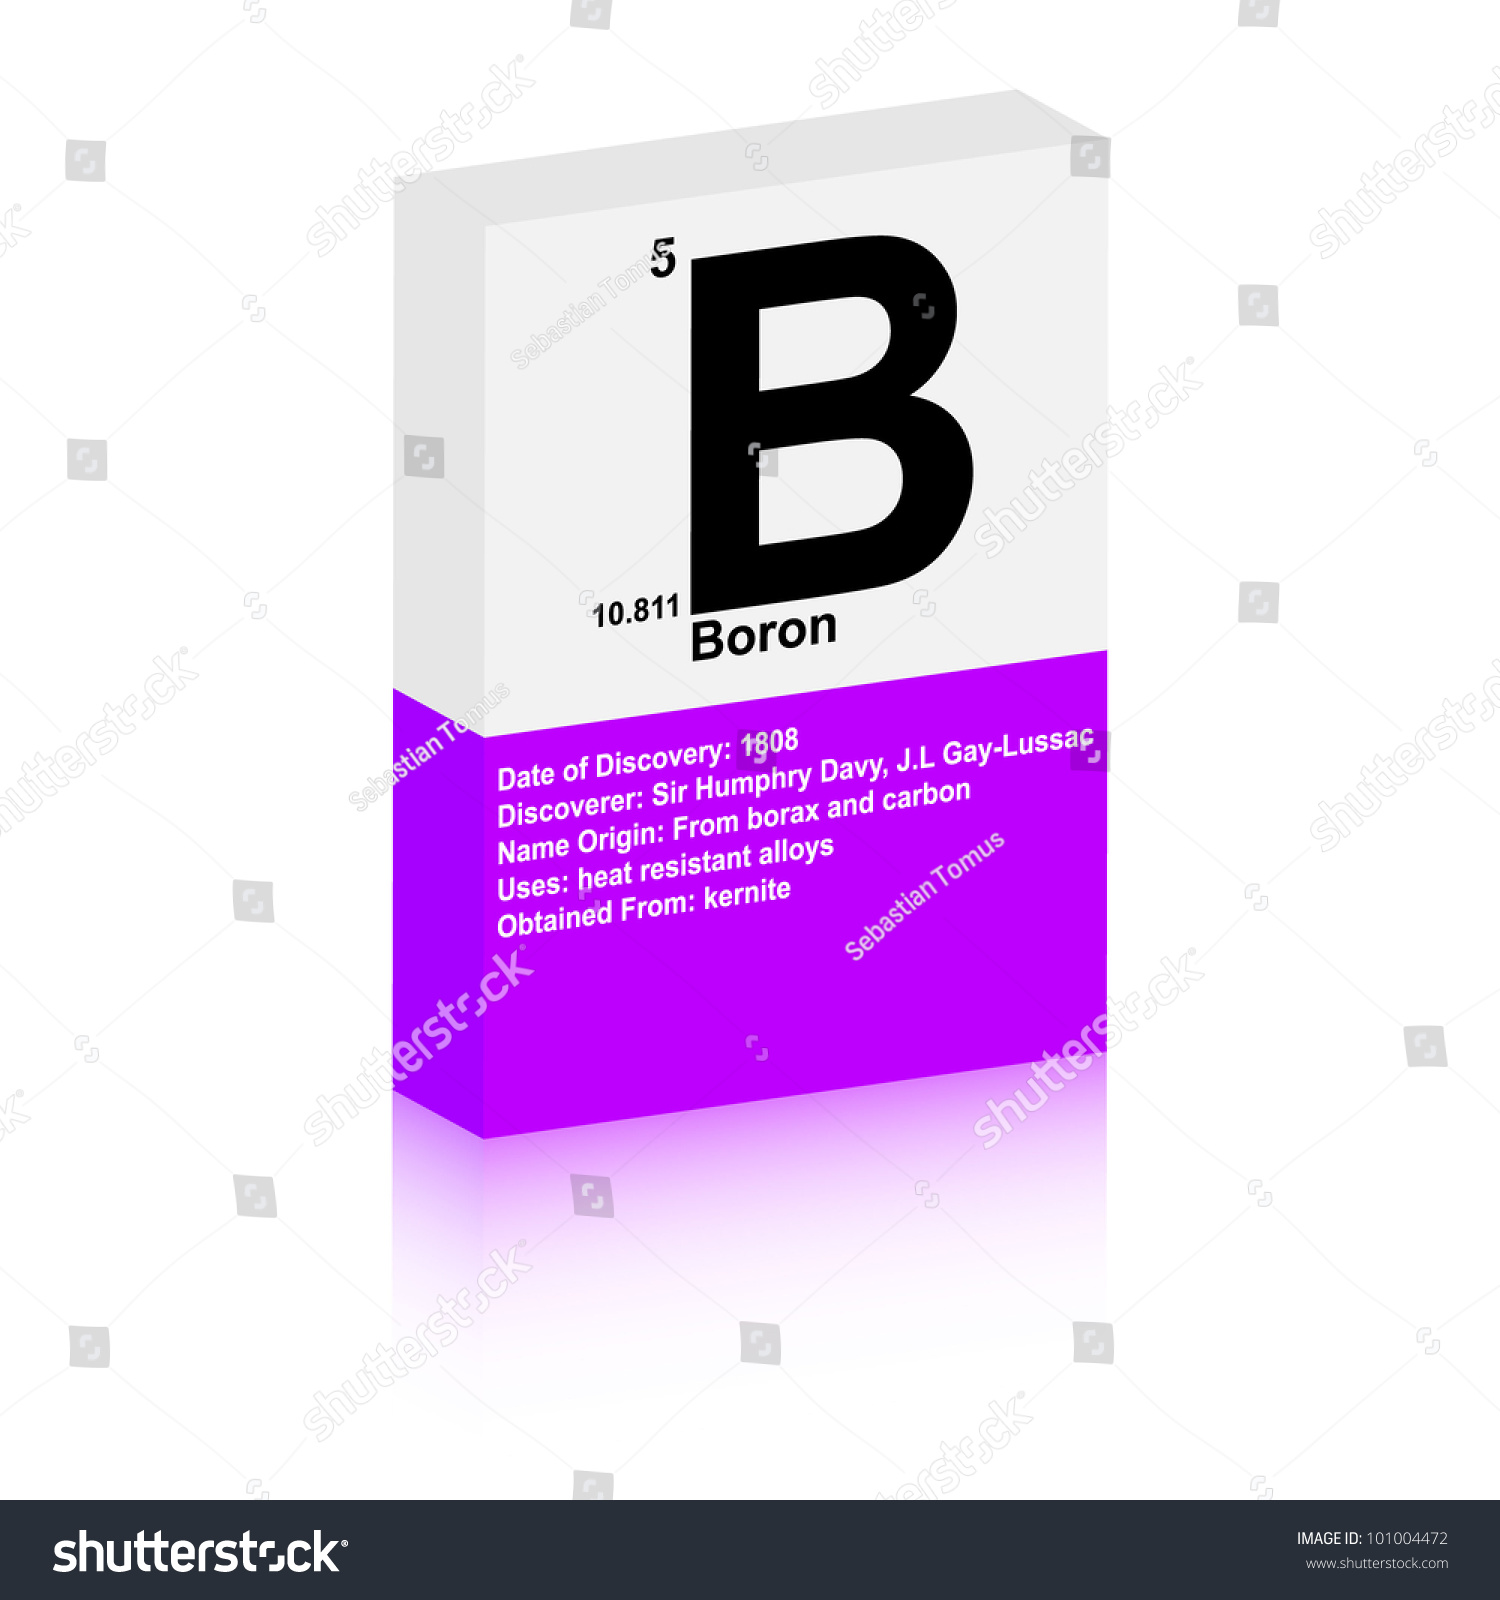 The symbol of boron images symbol and sign ideas boron symbol stock vector 101004472 shutterstock boron symbol buycottarizona buycottarizona